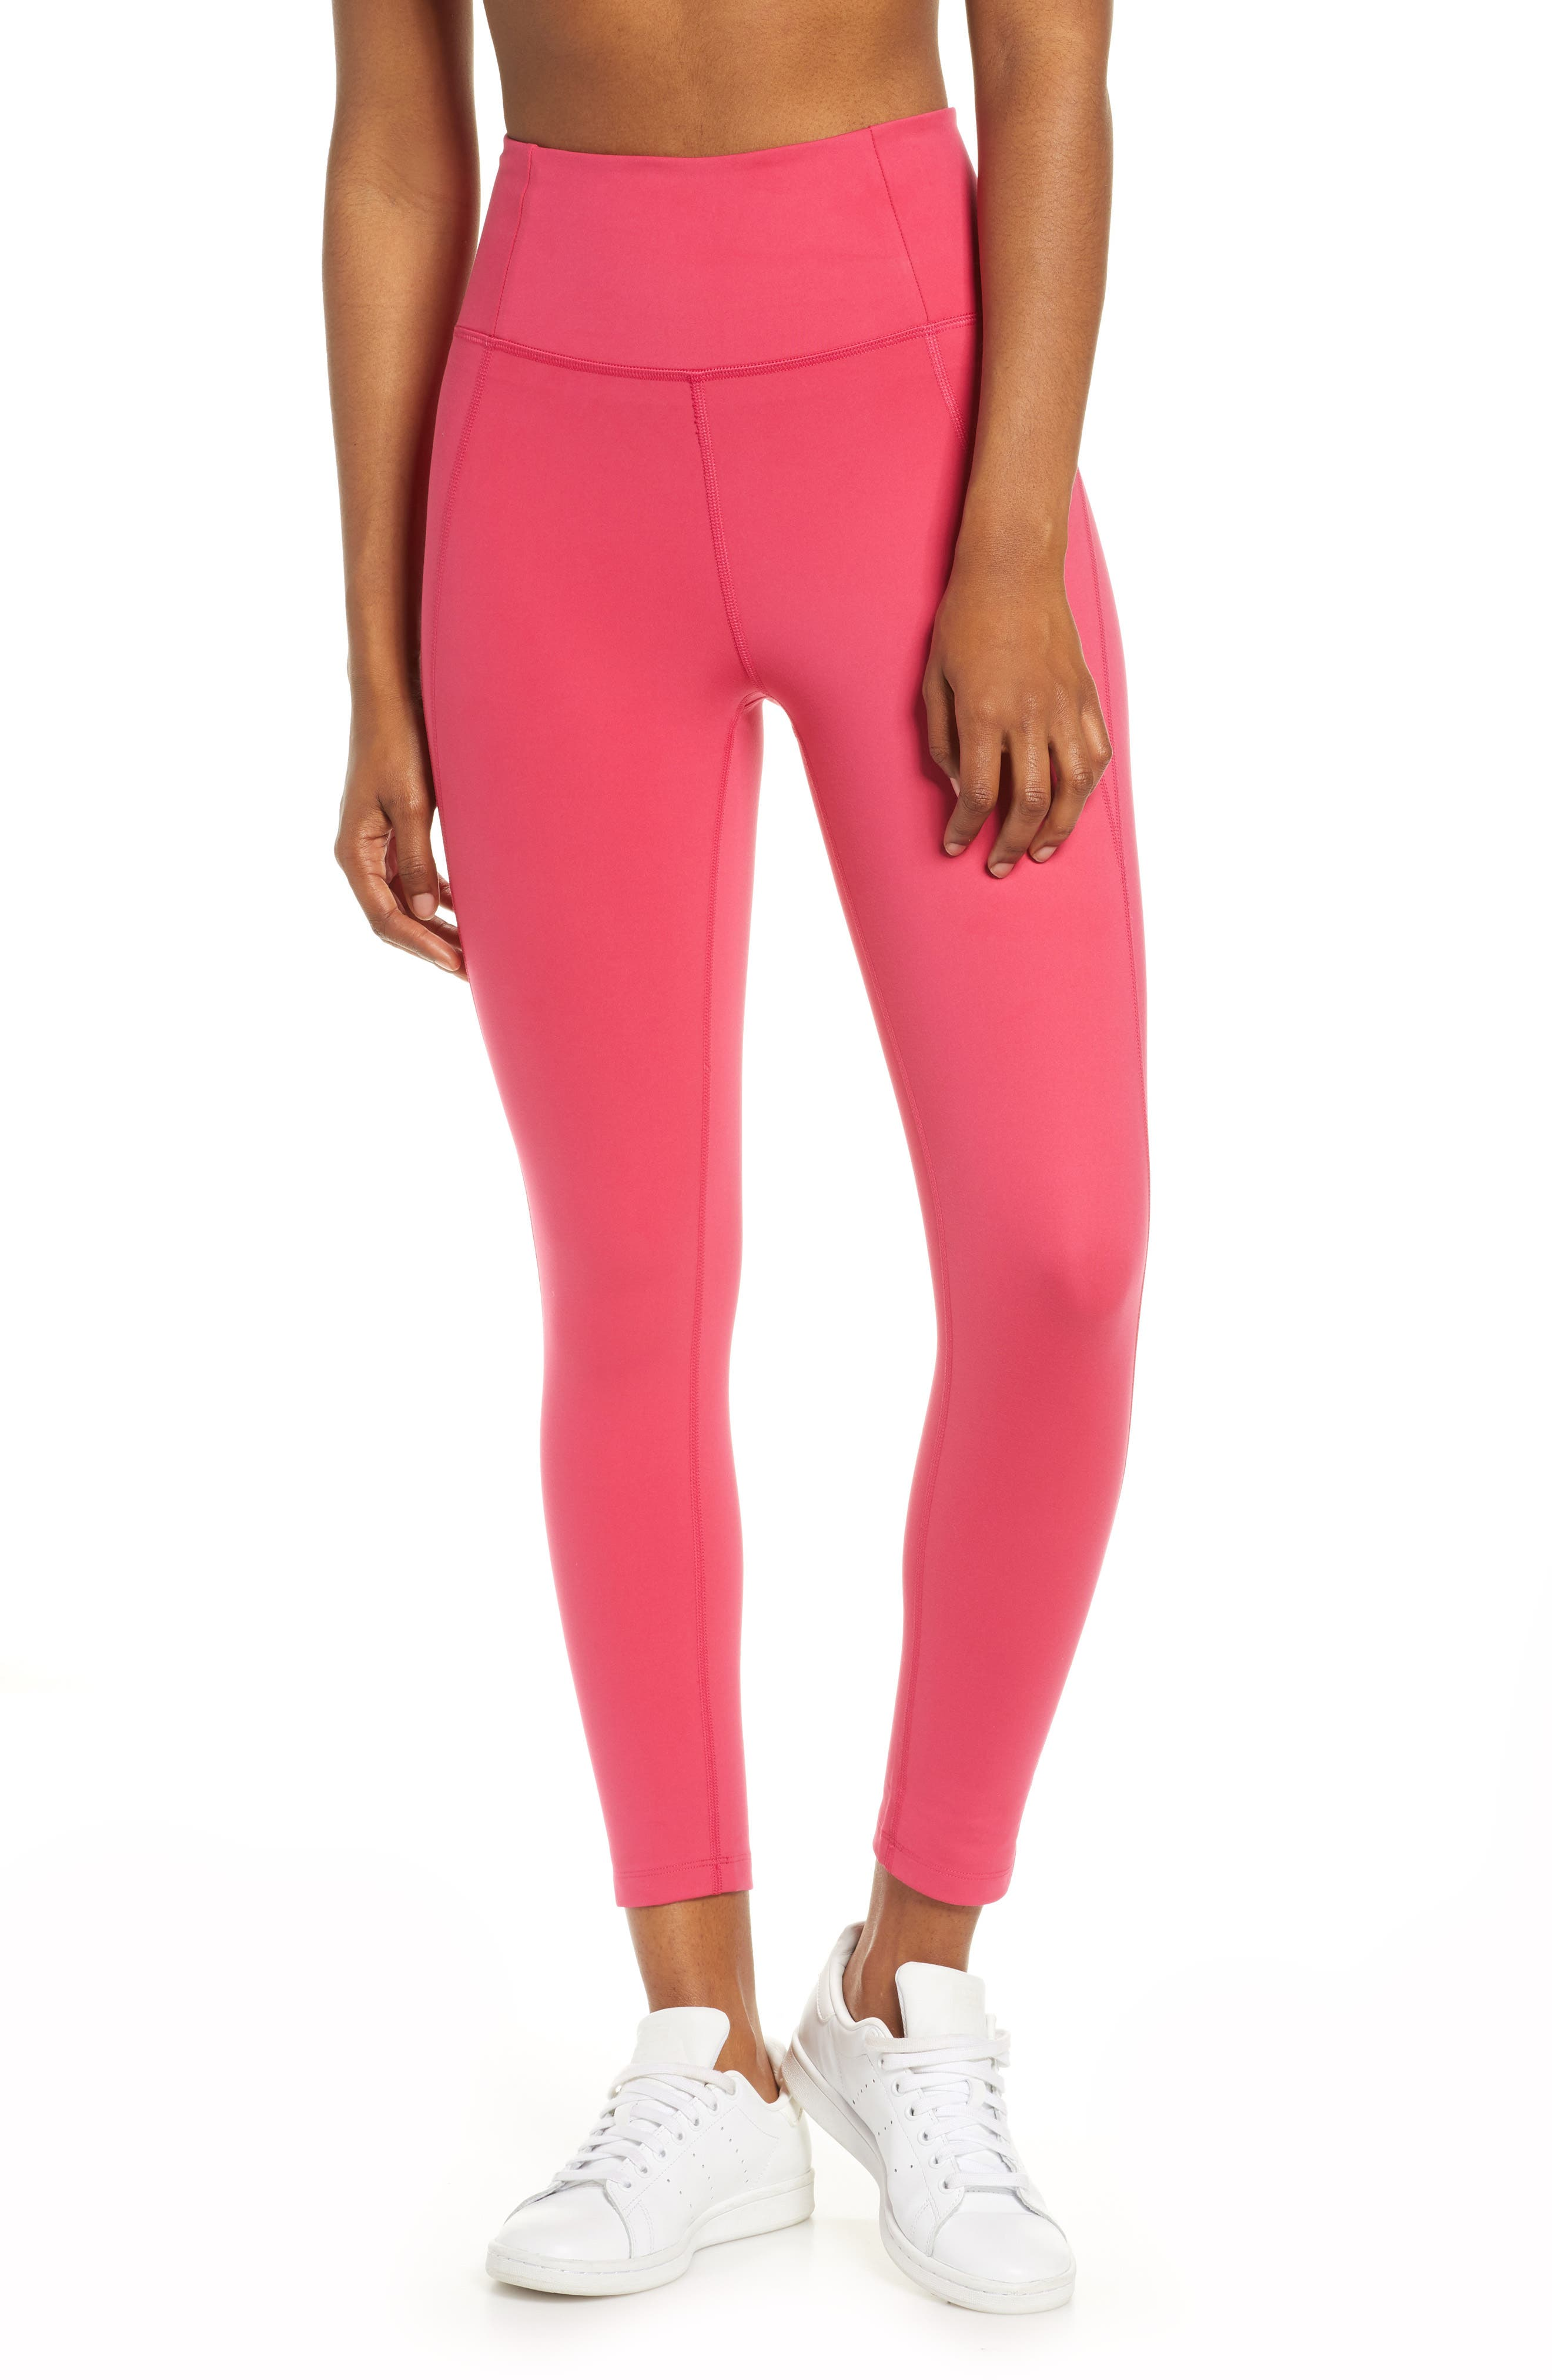 Women's Girlfriend Collective High Waist 7/8 Leggings,  Large - Pink